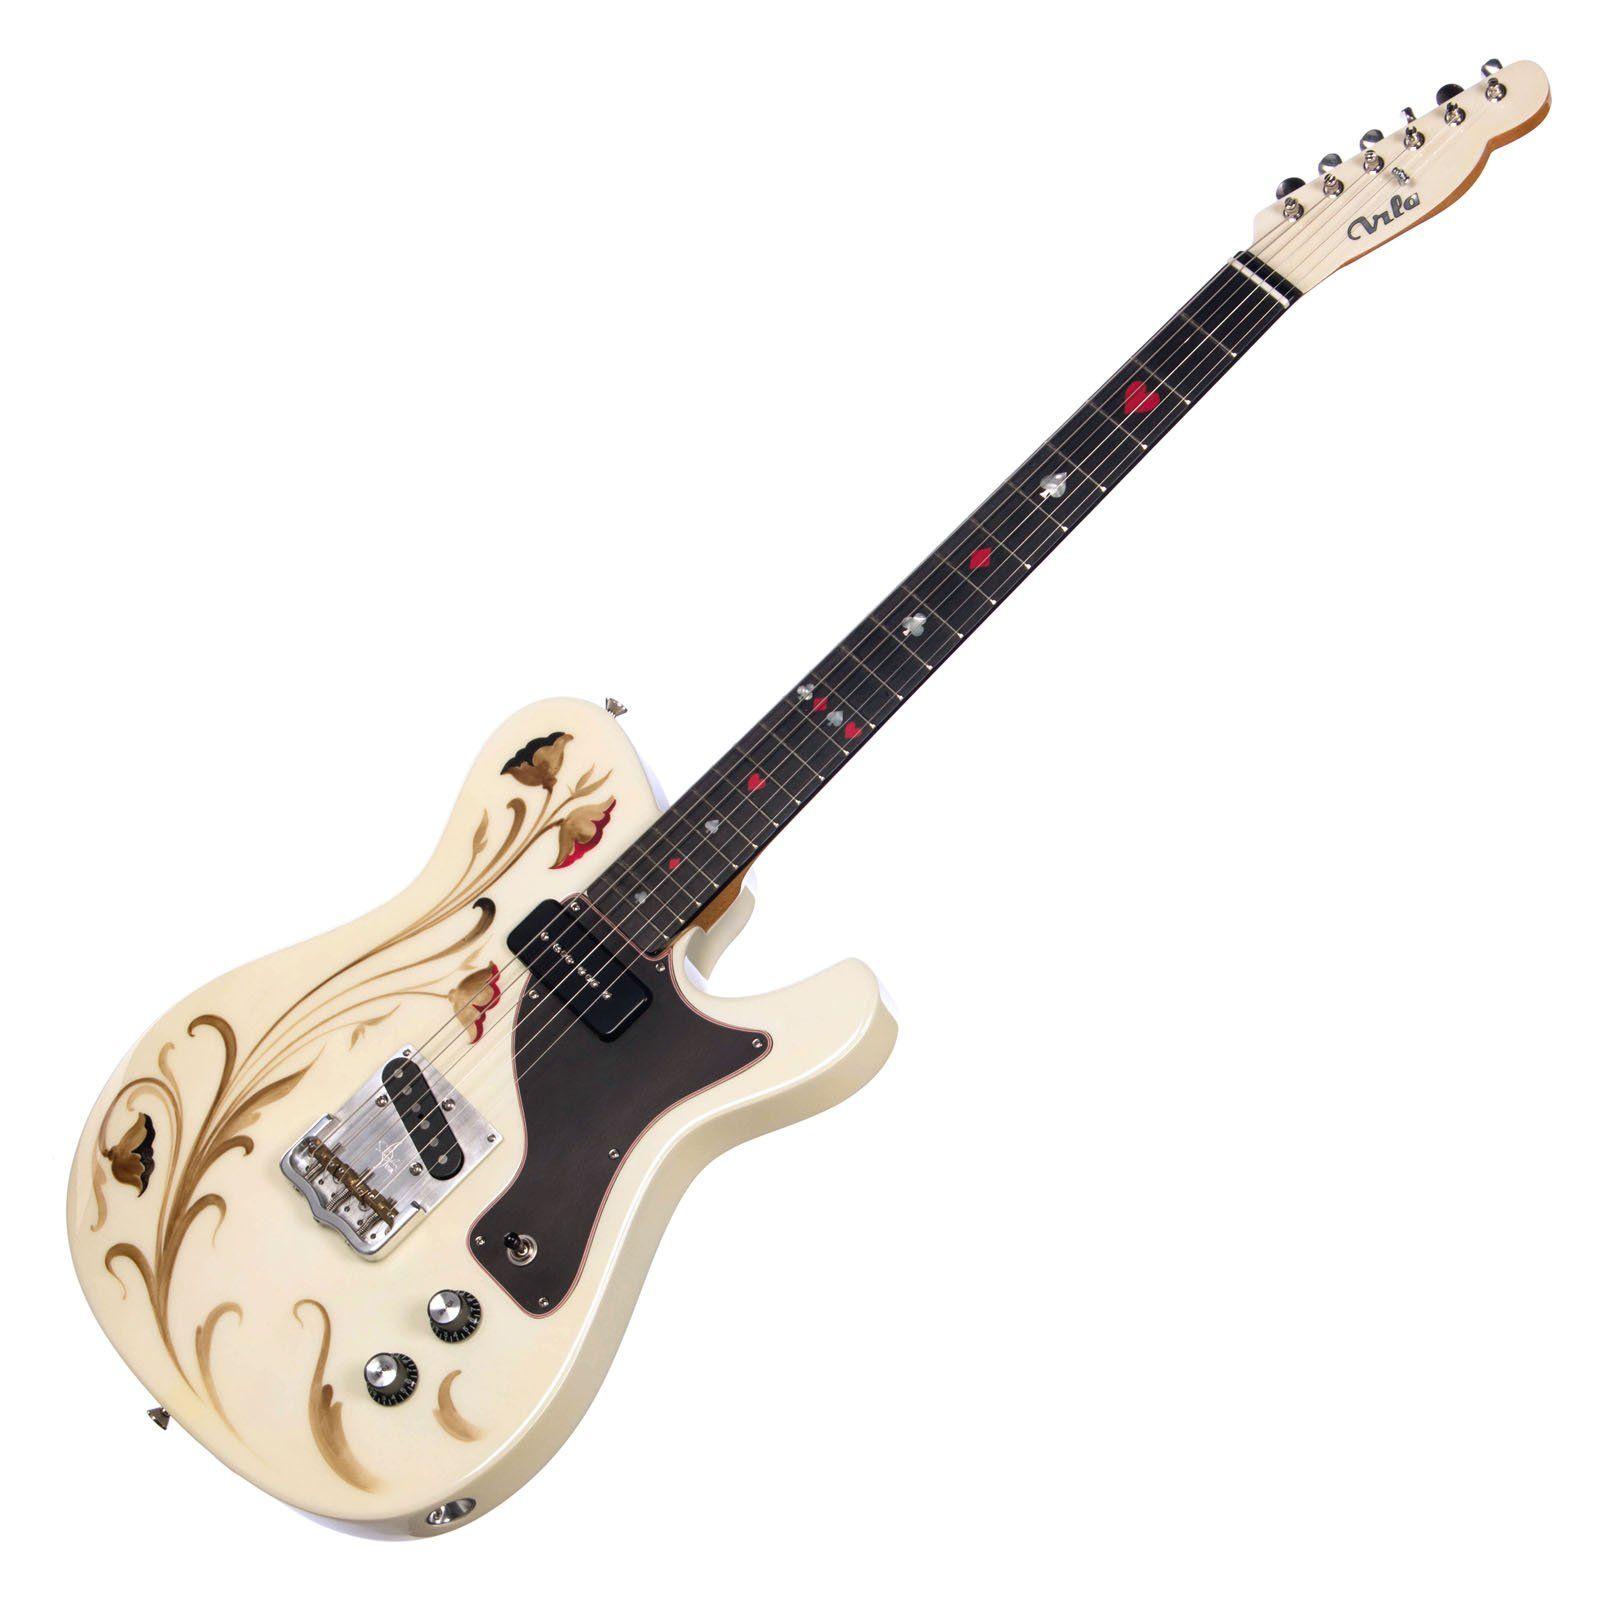 Vila Custom Guitars And Basses Telmo Vintage White Custom Hand